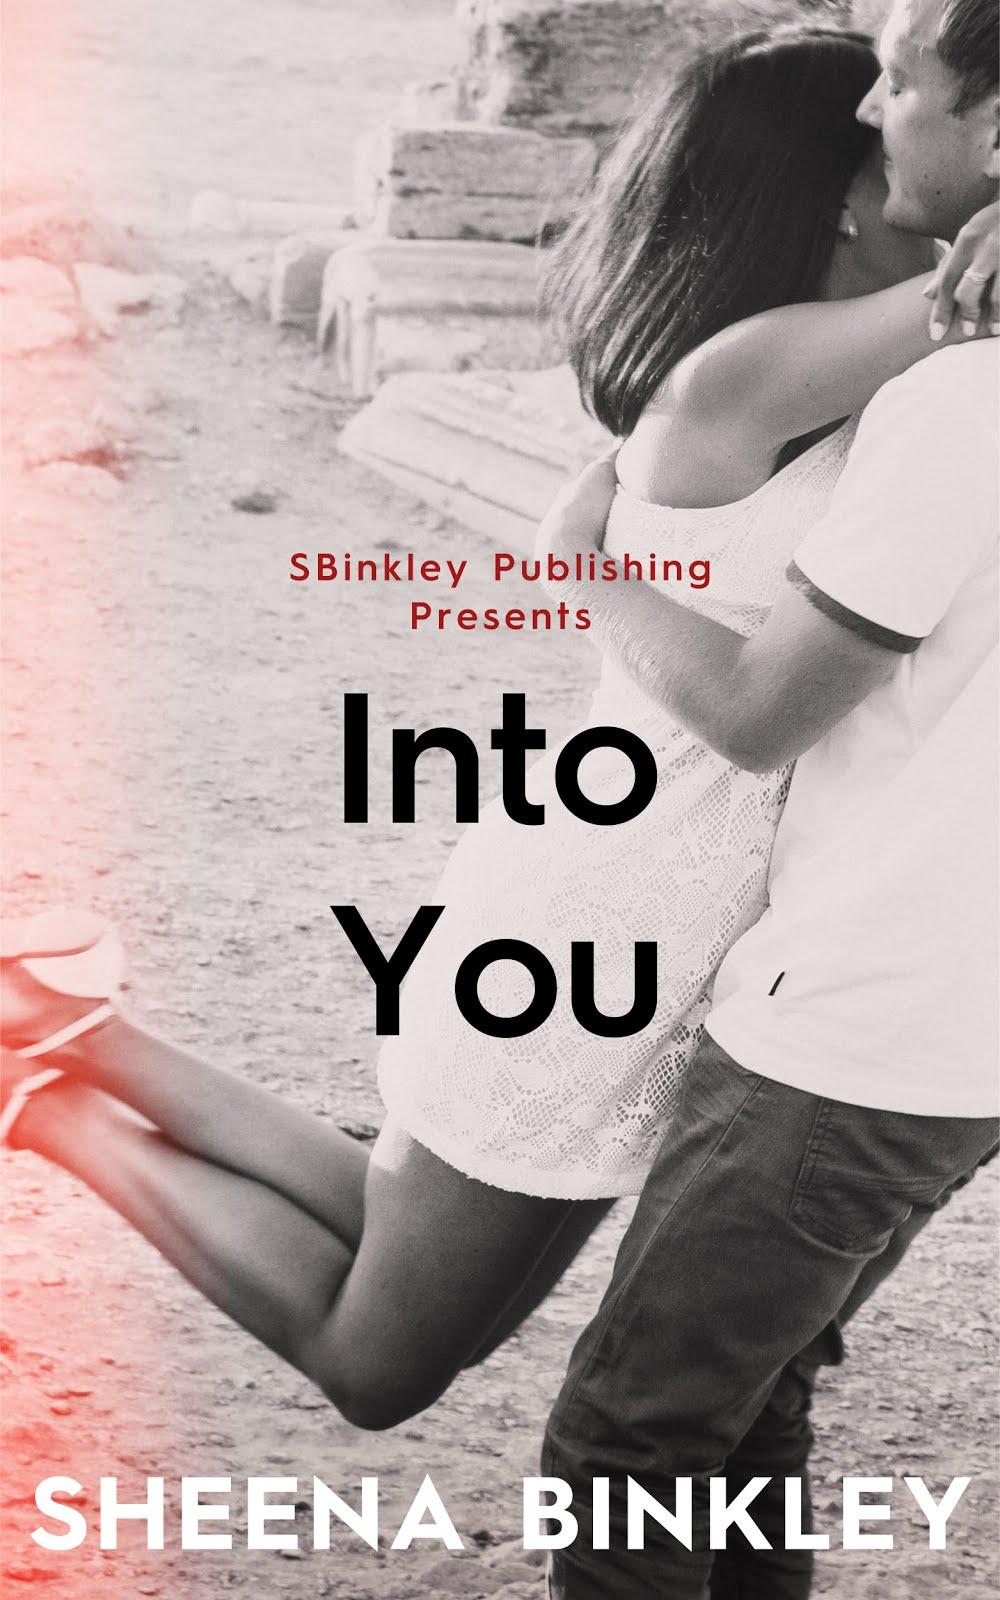 Into You by Sheena Binkley